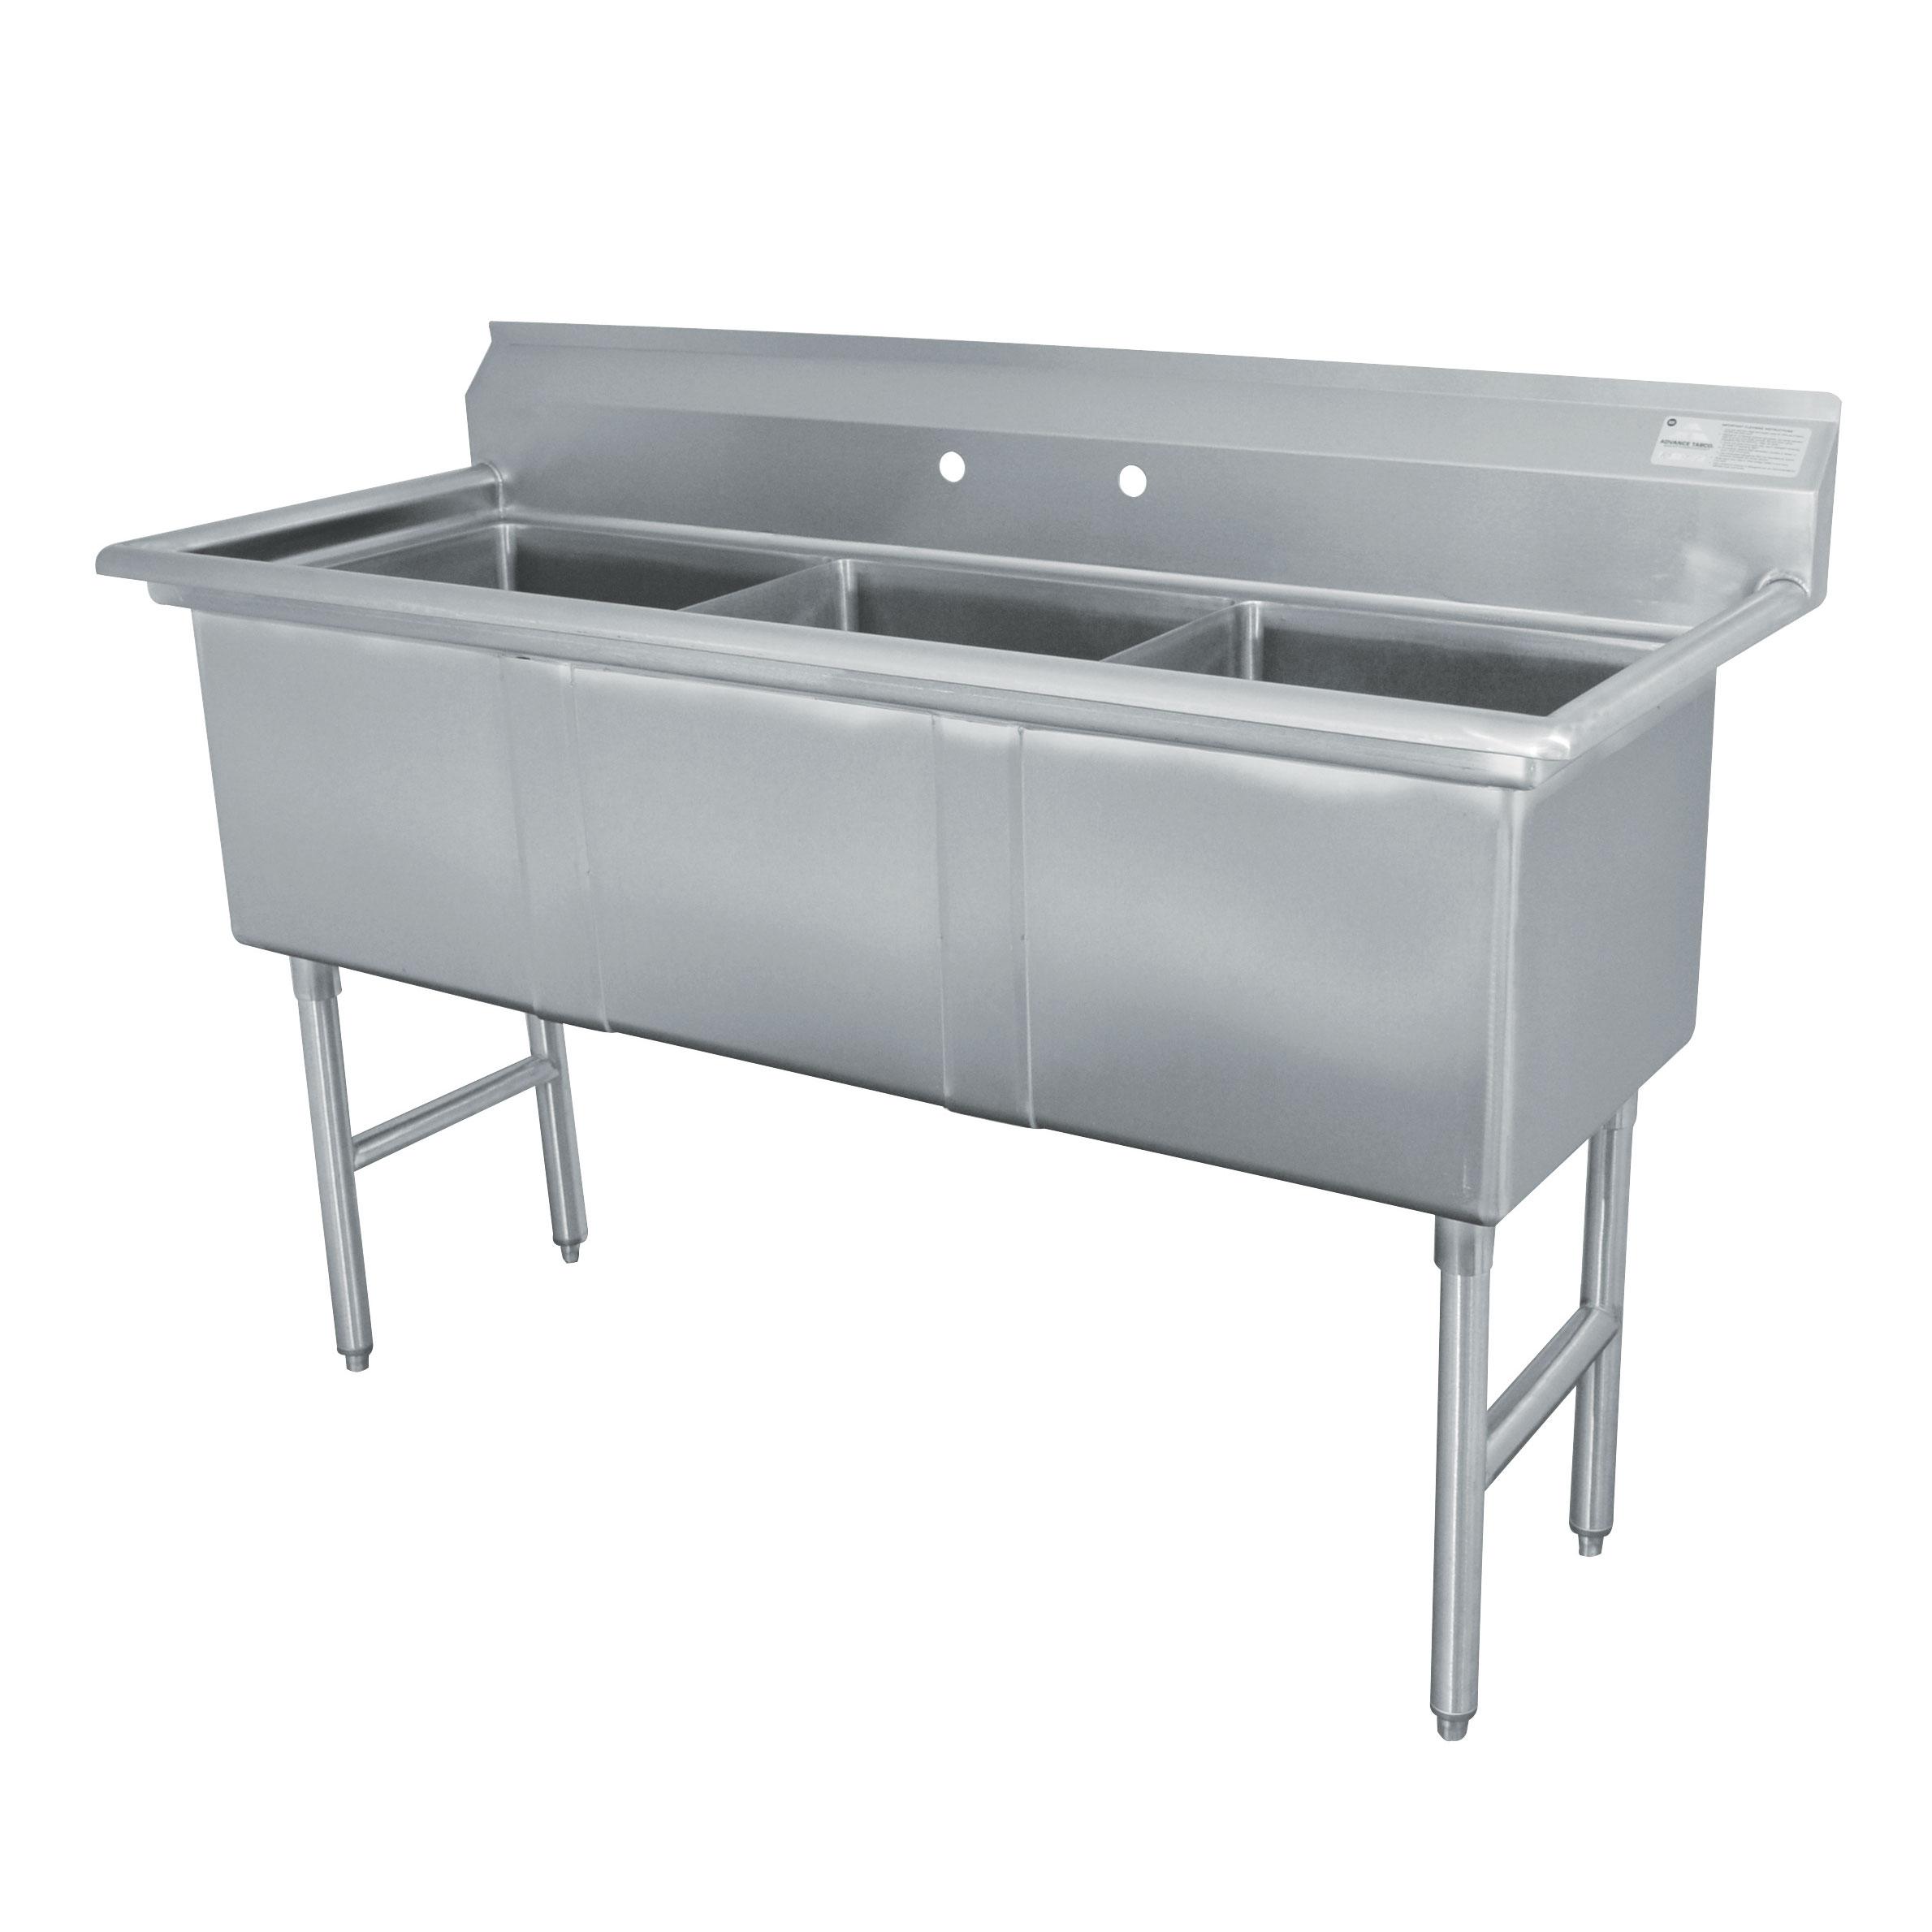 Advance Tabco FS-3-1824 sink, (3) three compartment